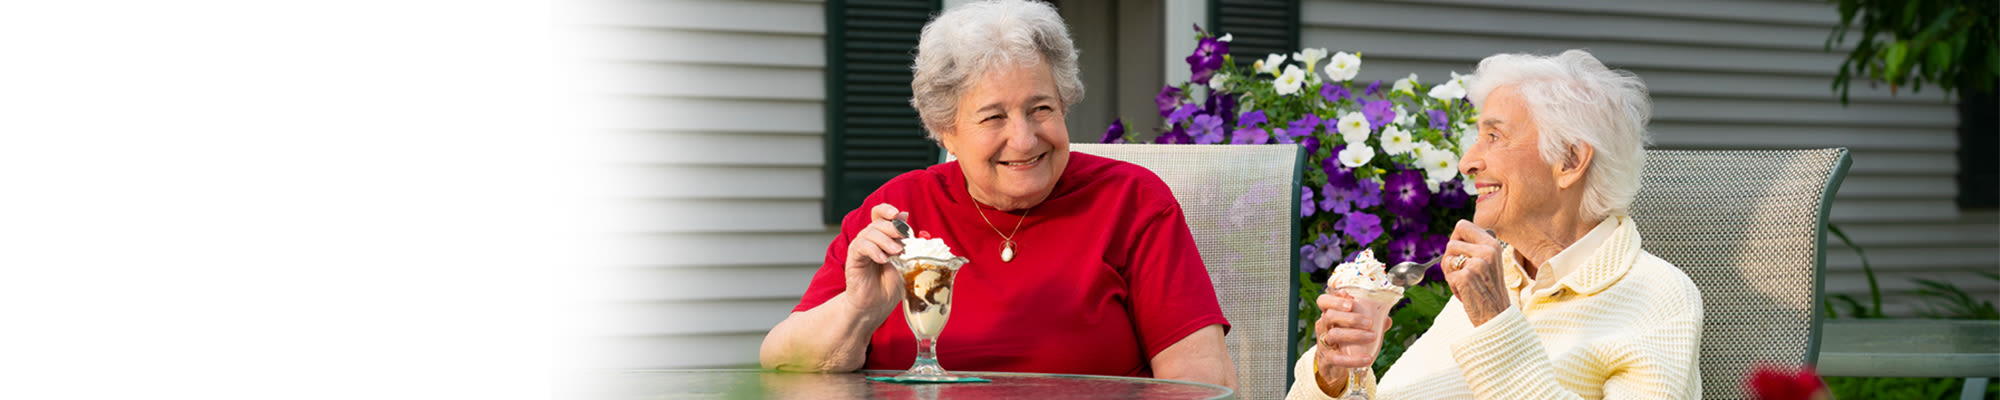 Senior living options at Woodstock Terrace in Woodstock, Vermont